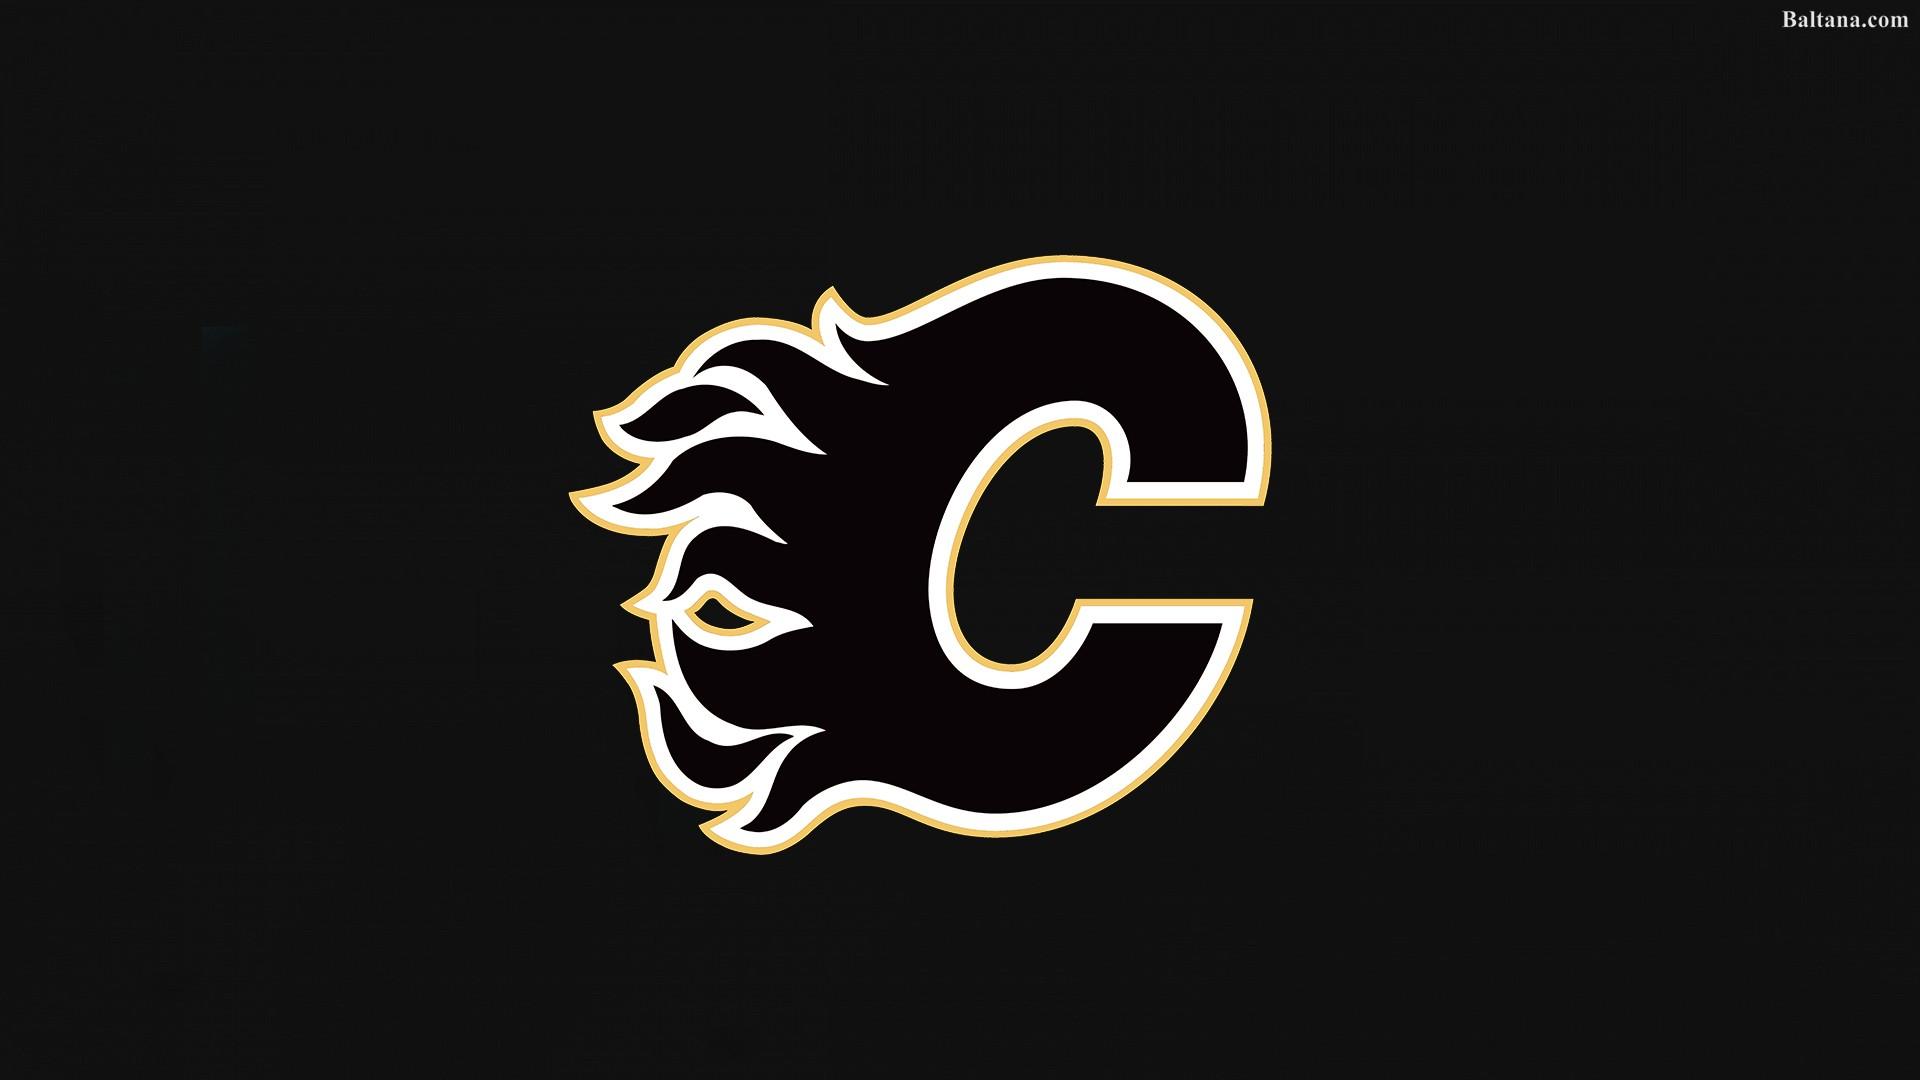 Calgary Flames Desktop Wallpaper Flames Vs Golden Knights 1920x1080 Wallpaper Teahub Io